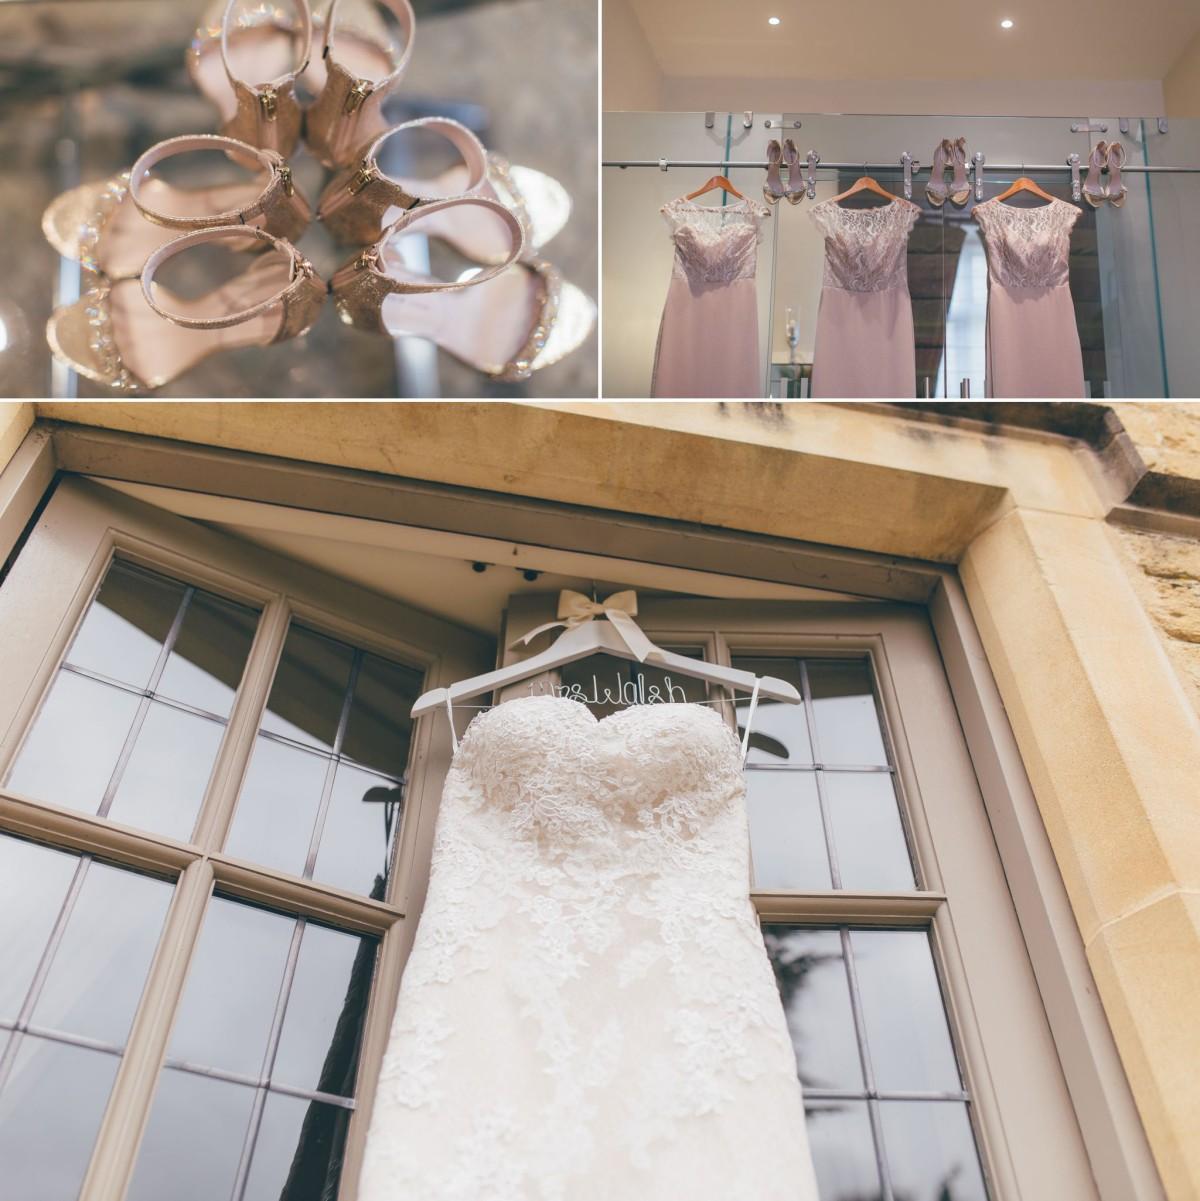 welsh_wedding_photographer_rachel_lambert_photography_lower_slaughter_manor_house_cotswolds_harriet_dean_ 5